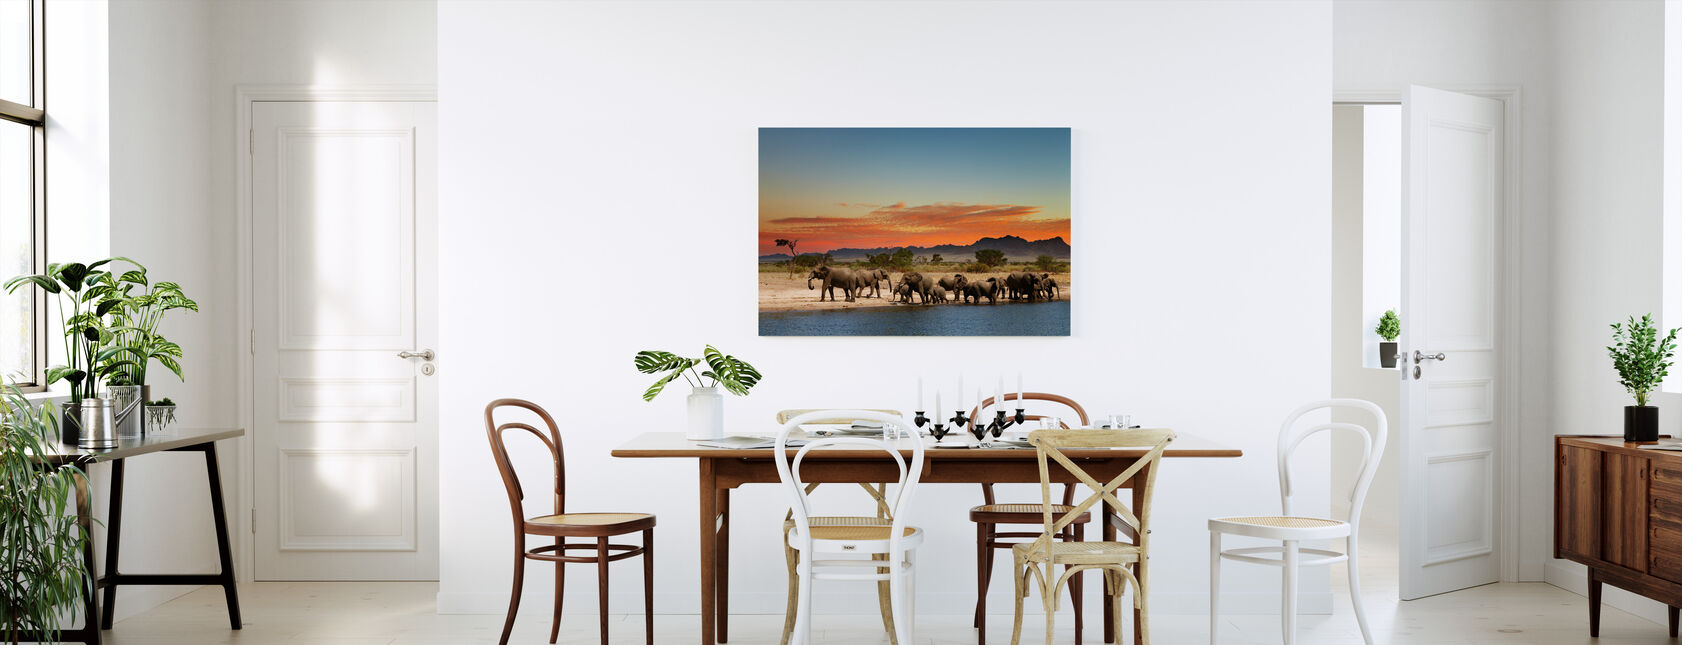 Kudde olifanten - Canvas print - Keuken